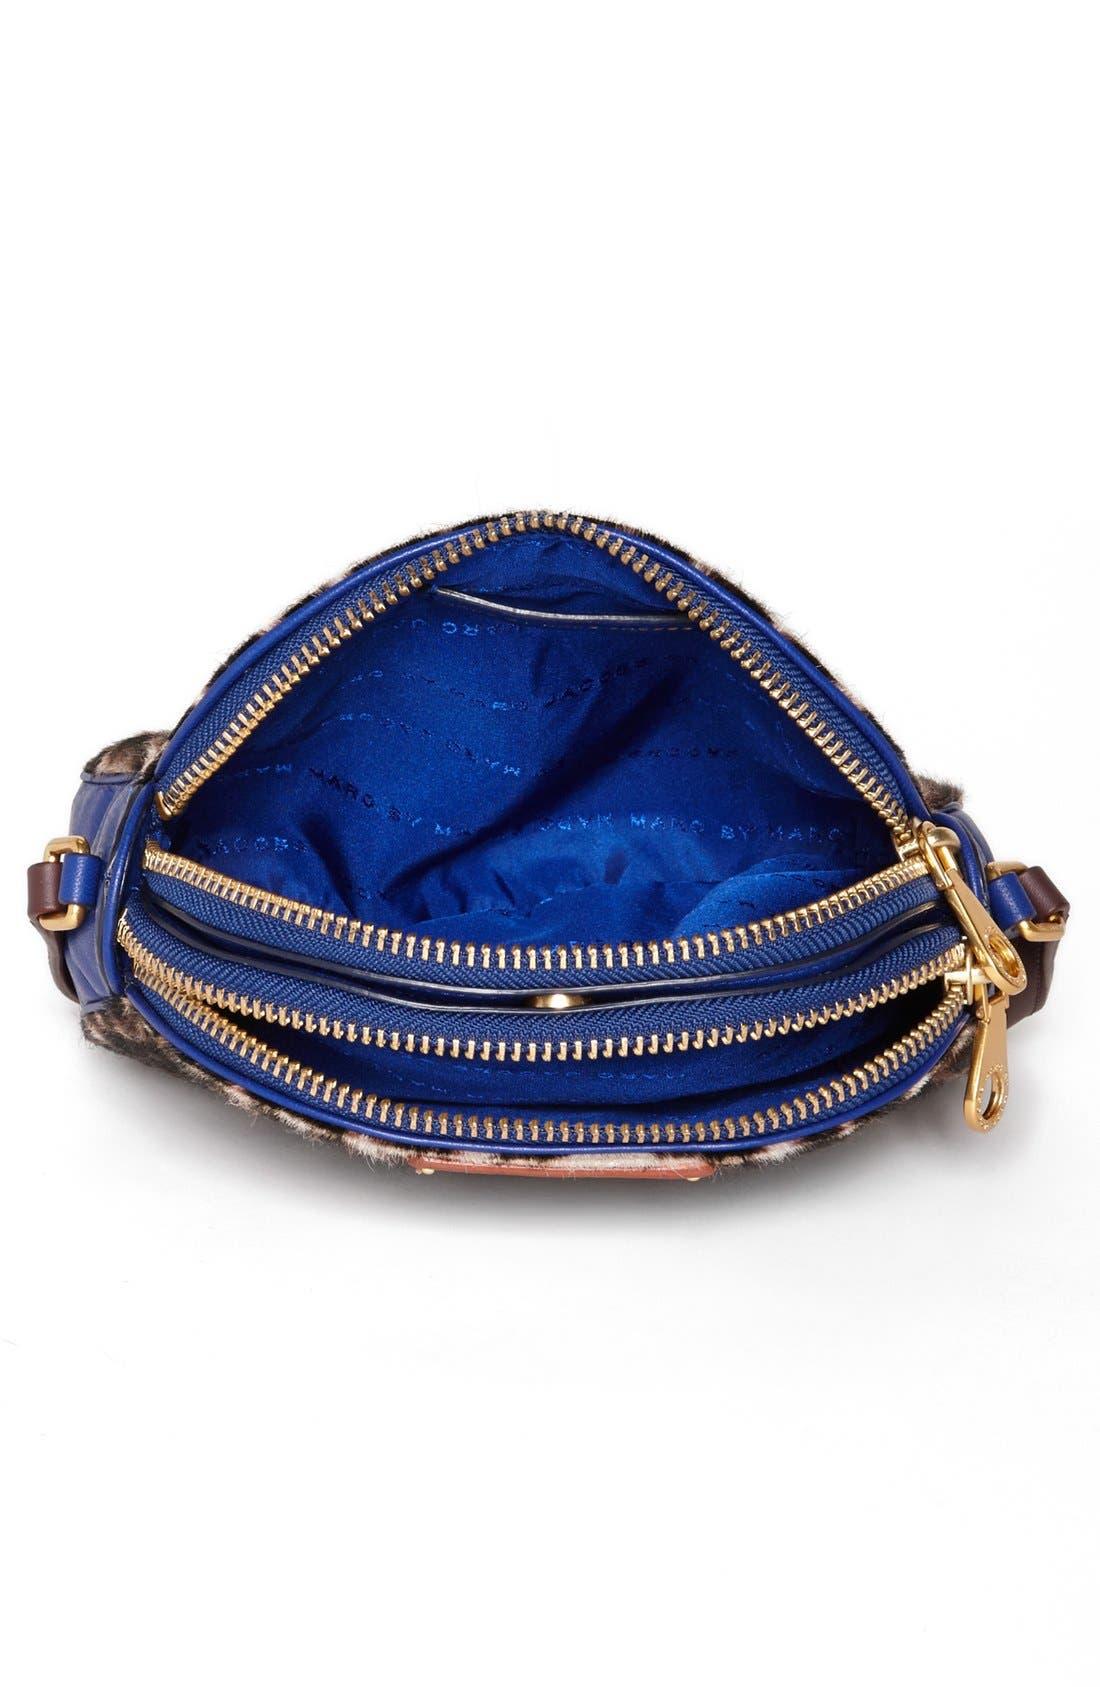 Alternate Image 3  - MARC BY MARC JACOBS 'Lola' Calf Hair Crossbody Bag